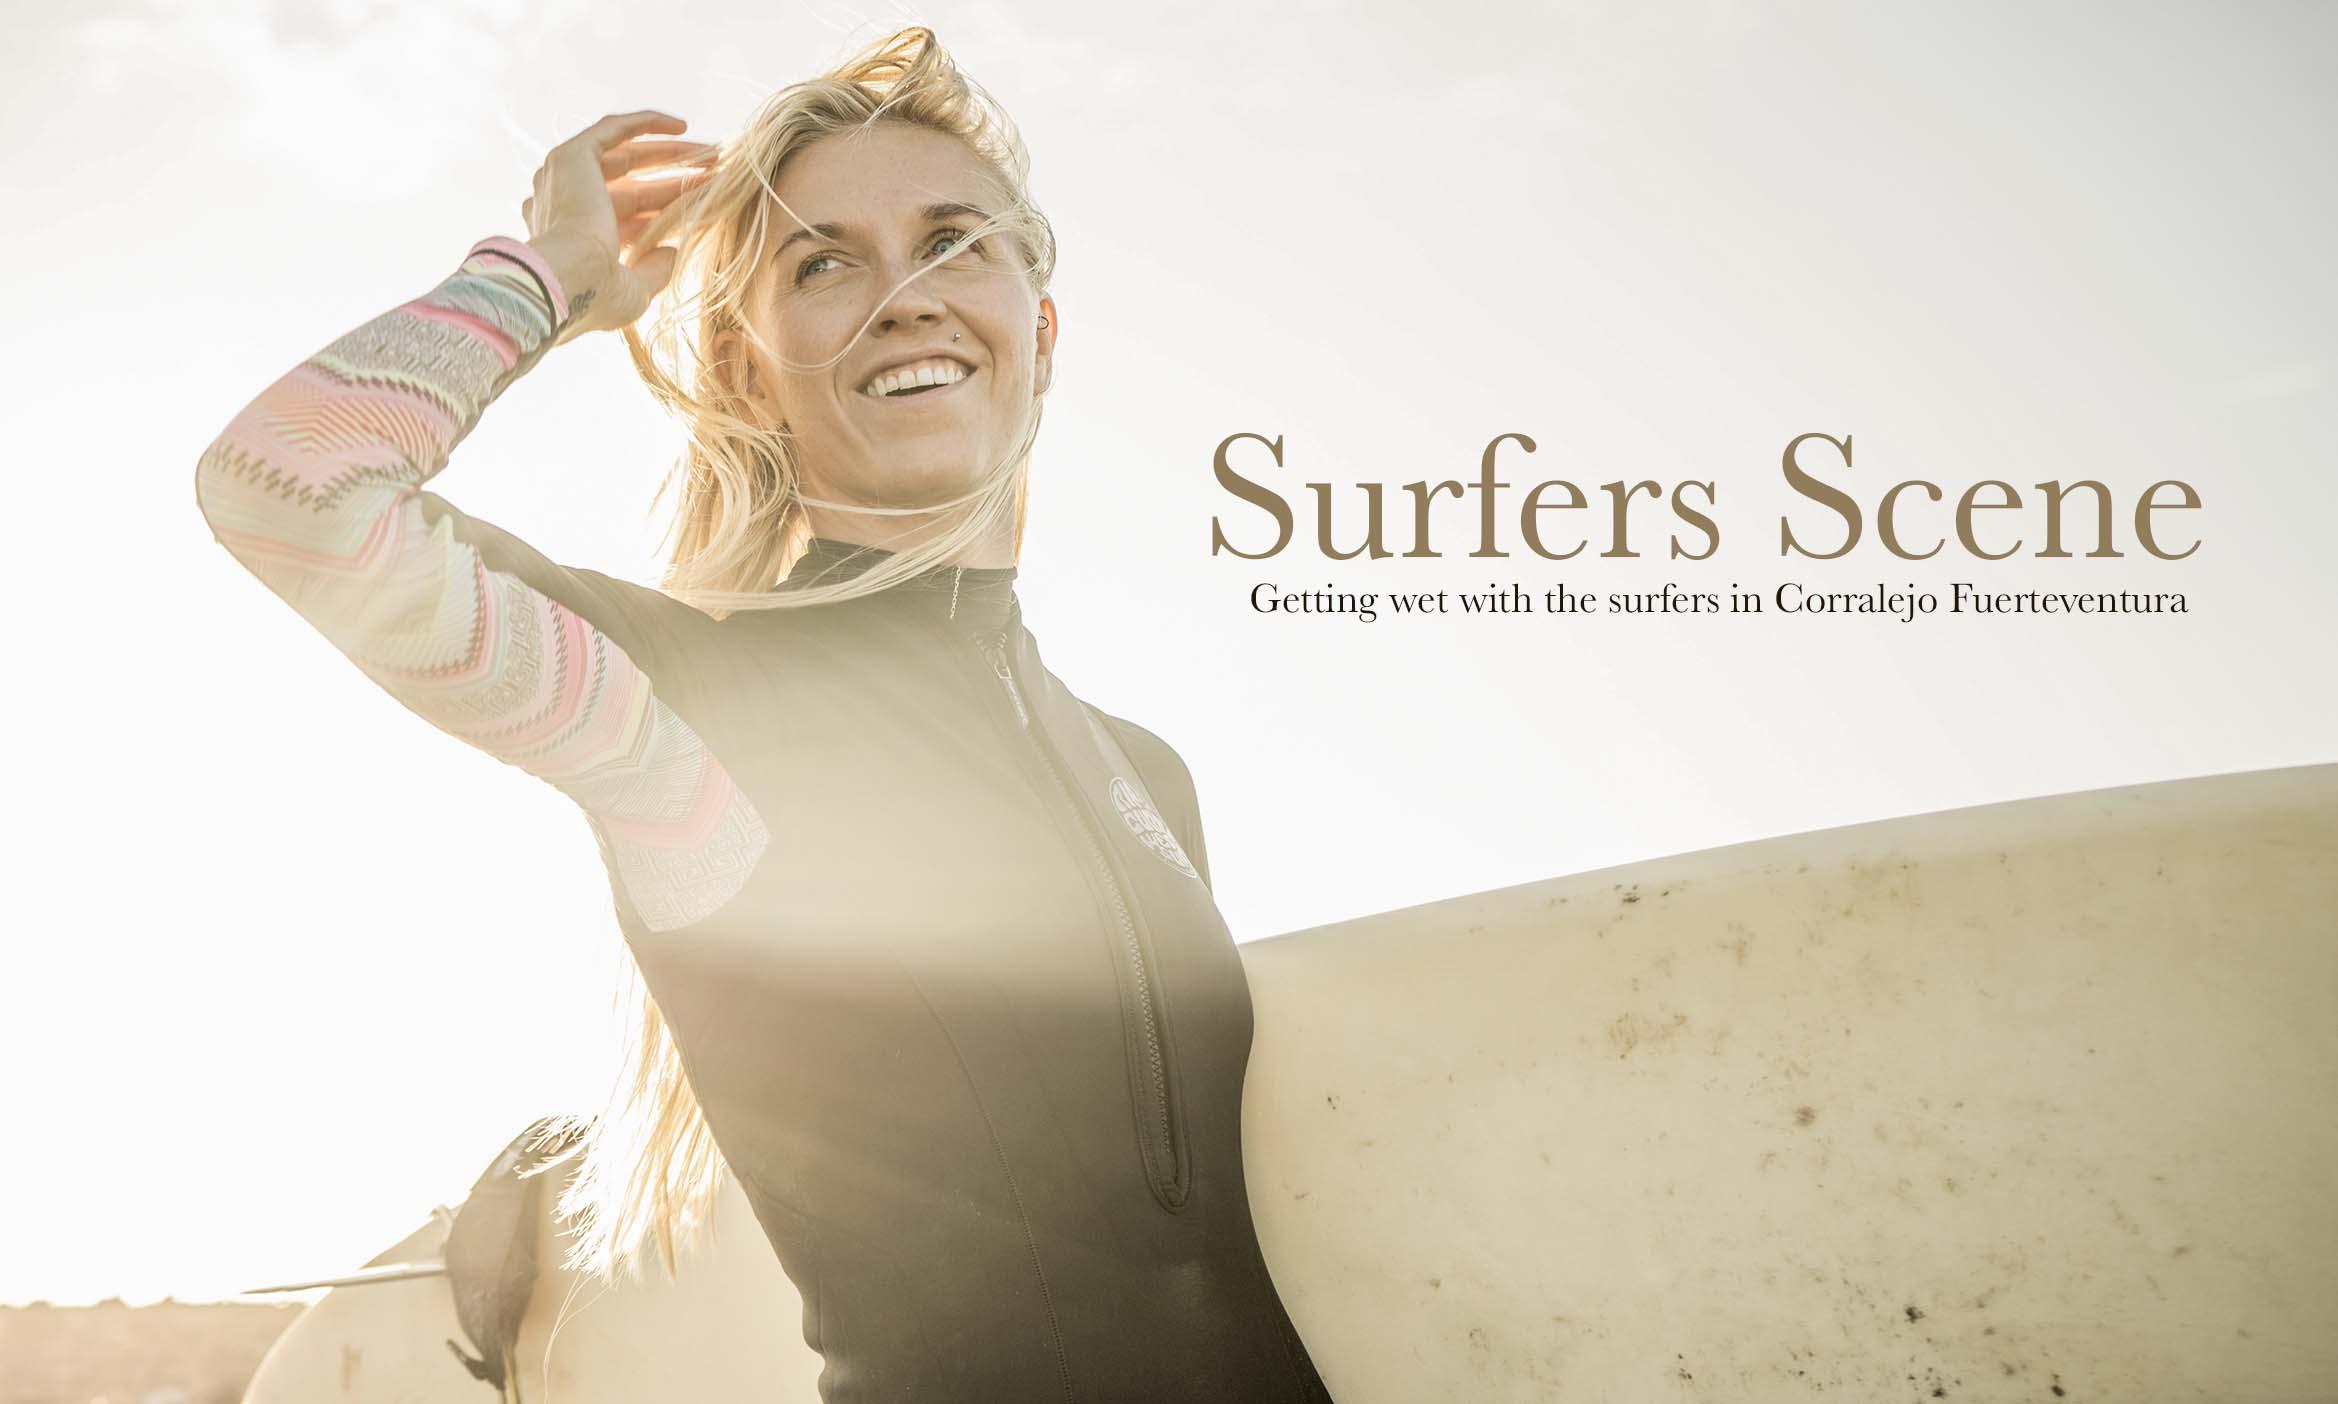 photography blog james nader - surfing in fuerteventura